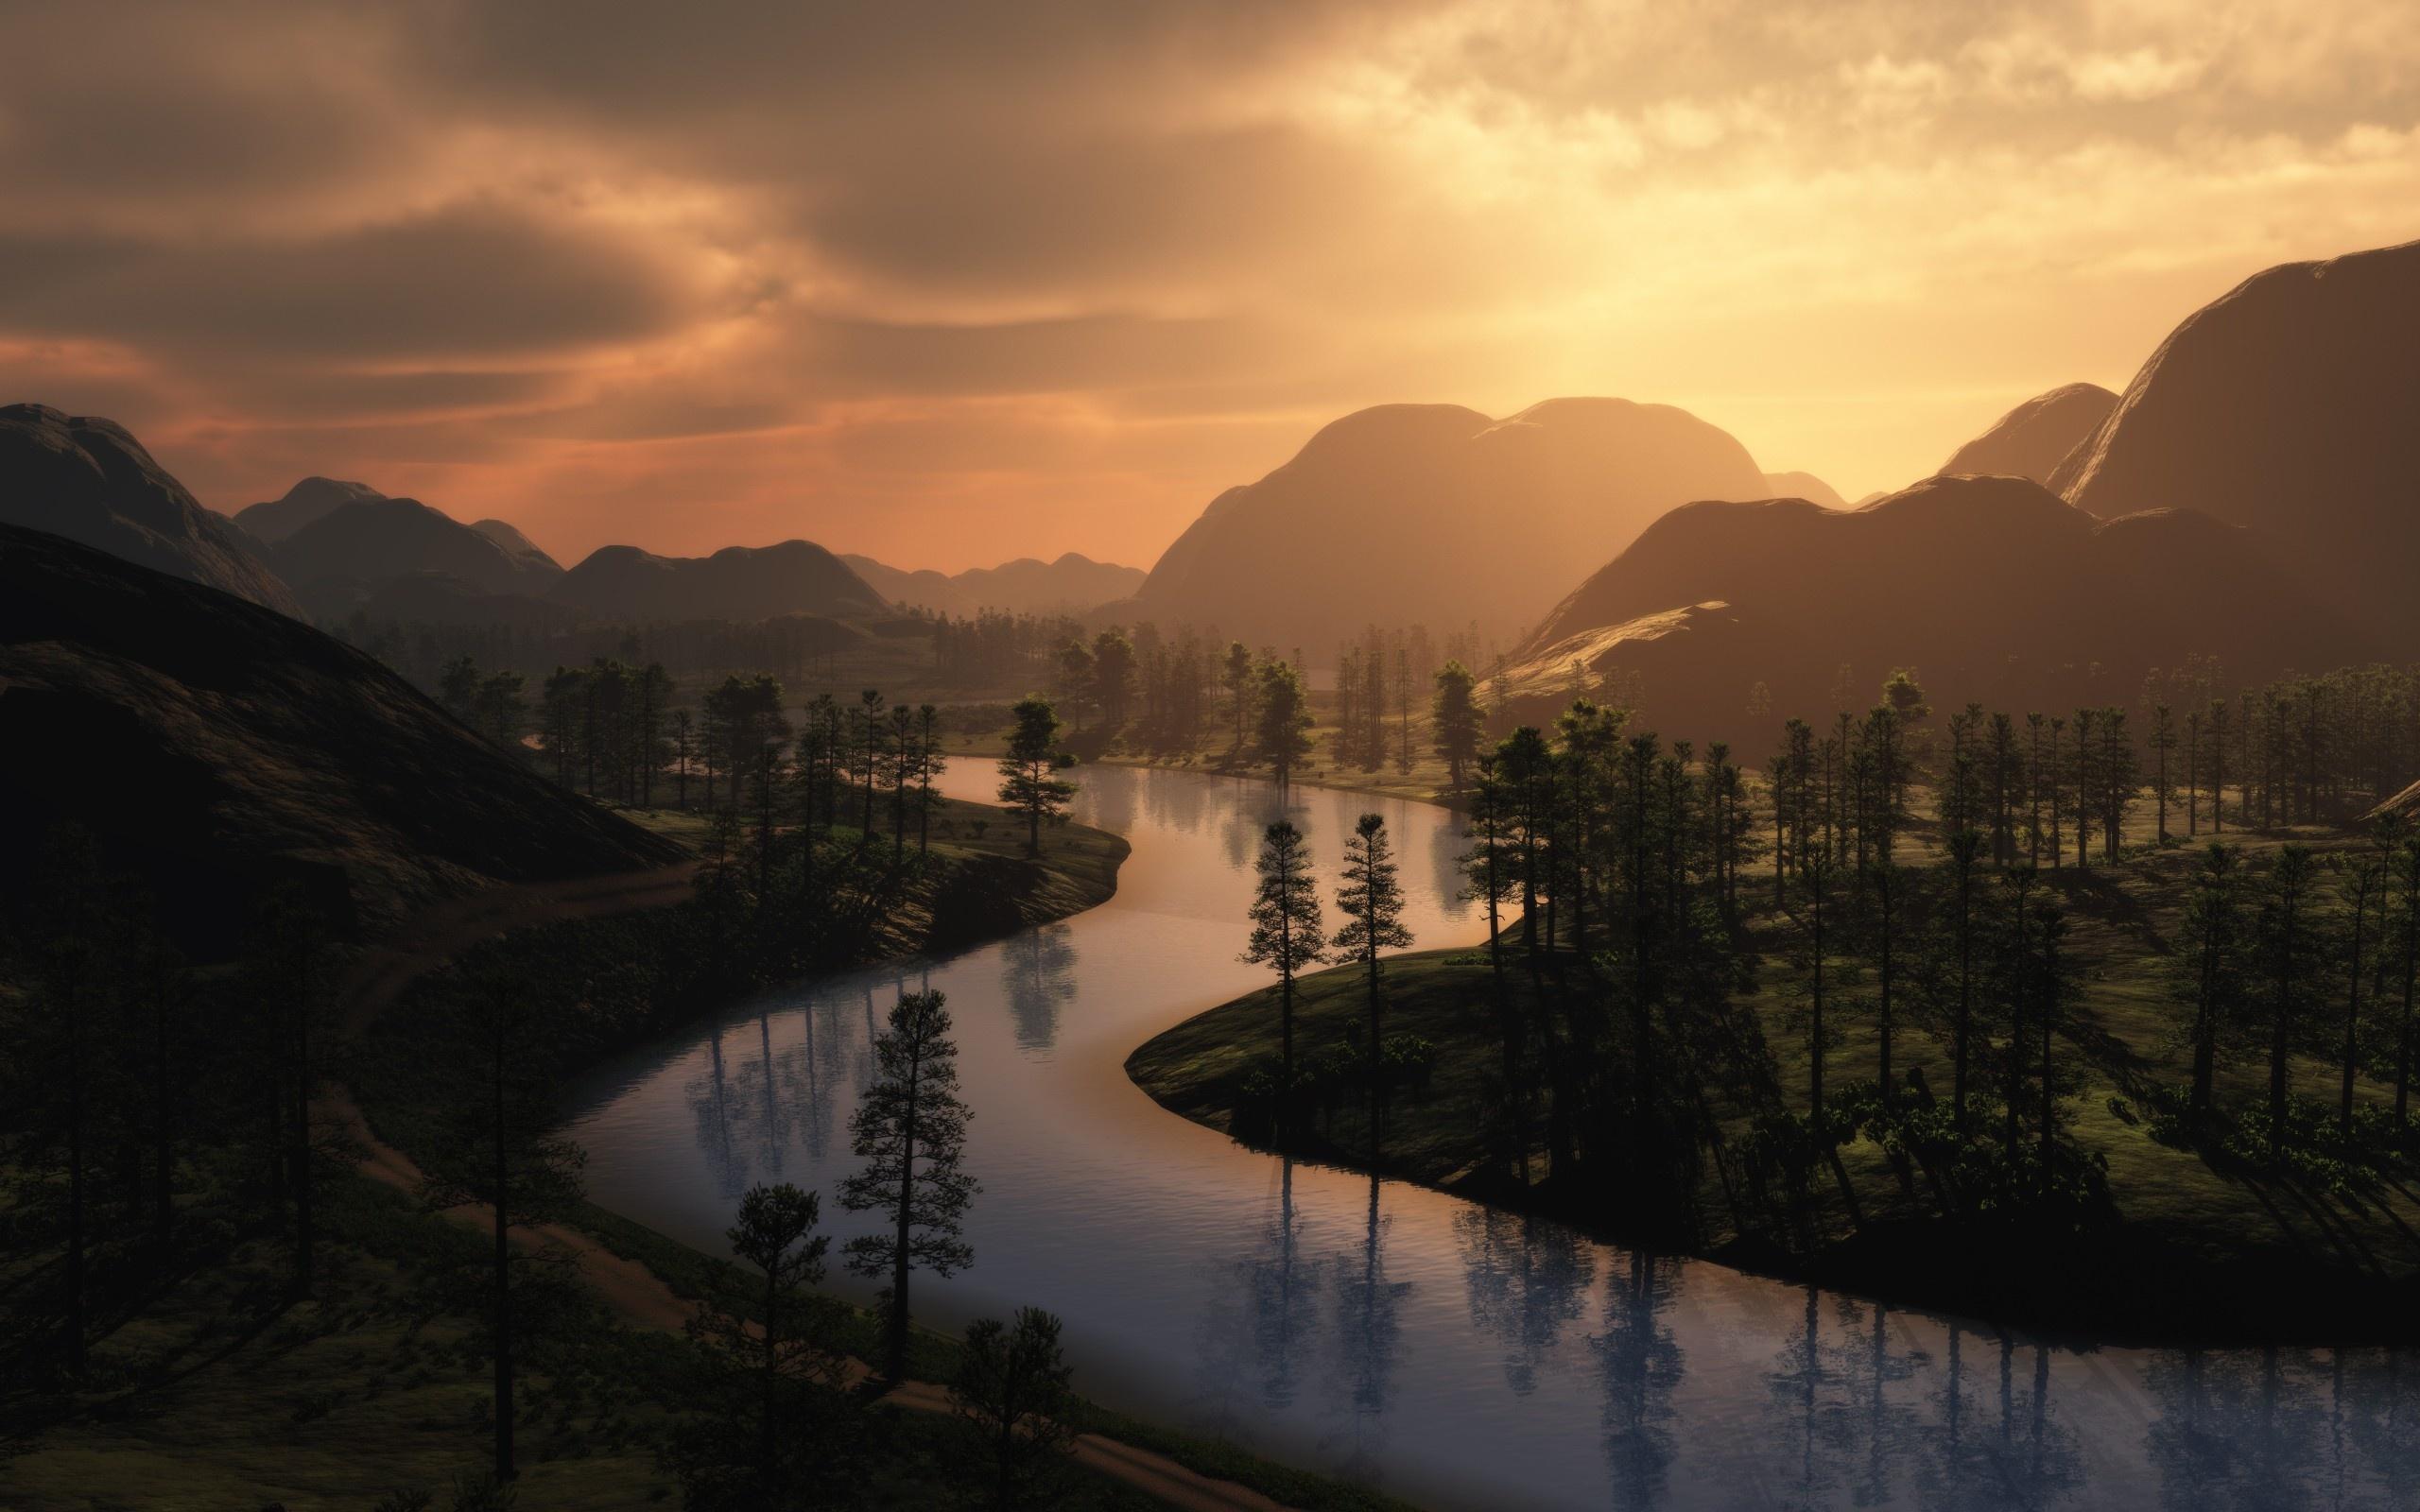 Компьютерная Графика - Природа  Valley Дерево река Вода гора Обои